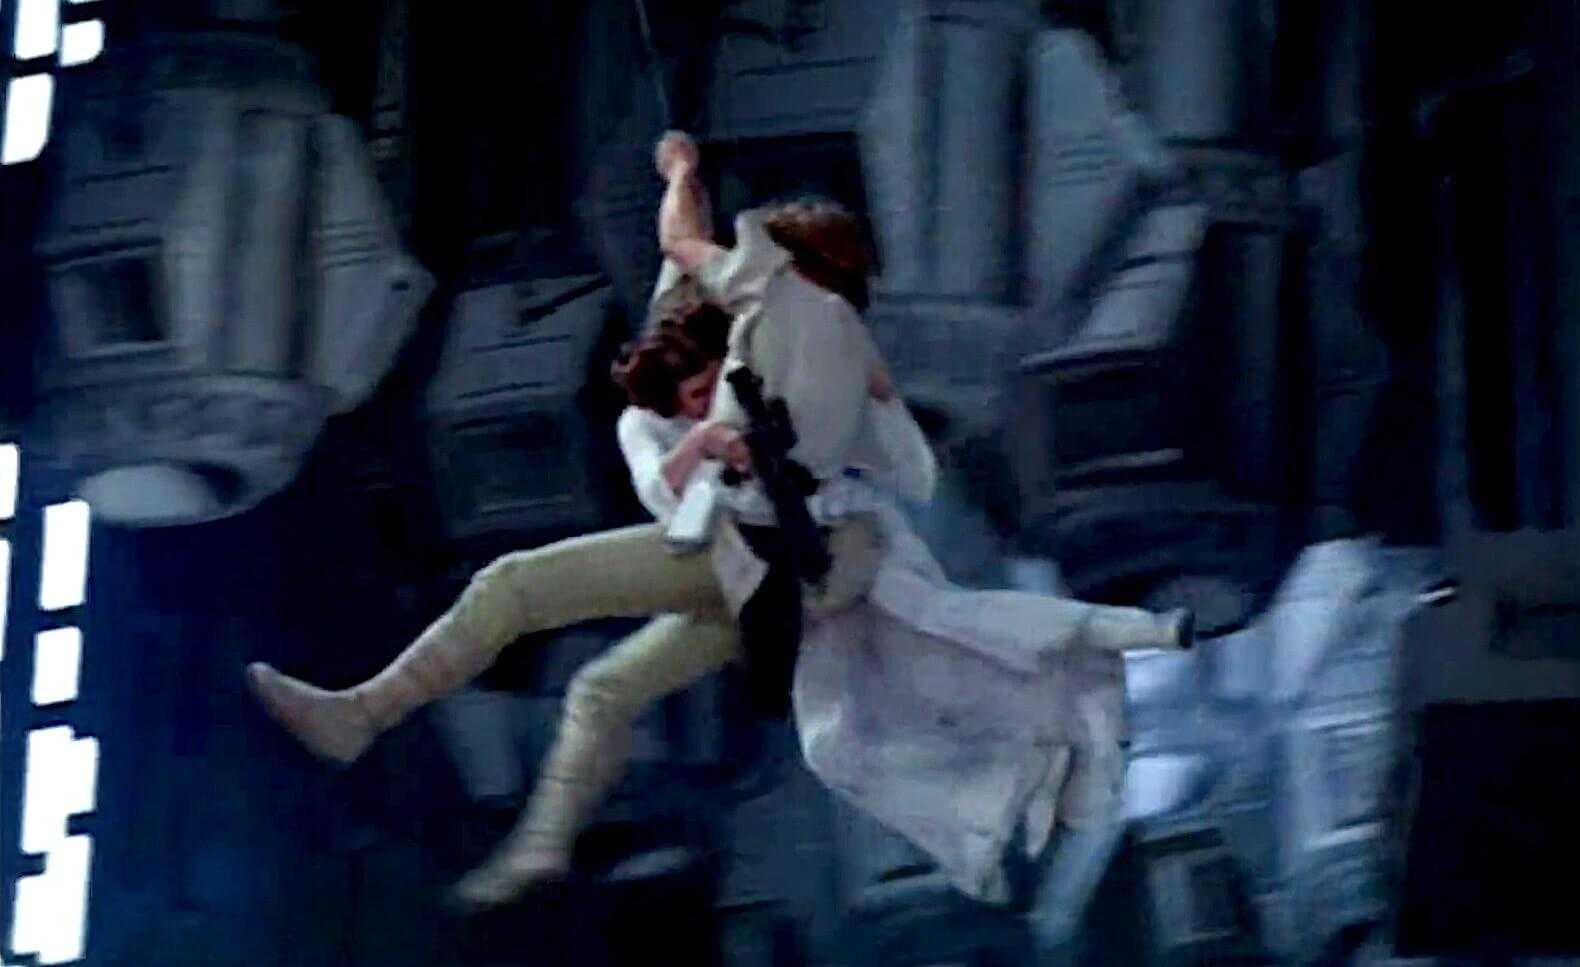 How to Write a Story Outline - Free Script Template - Luke Skywalker Saves Princess Leia